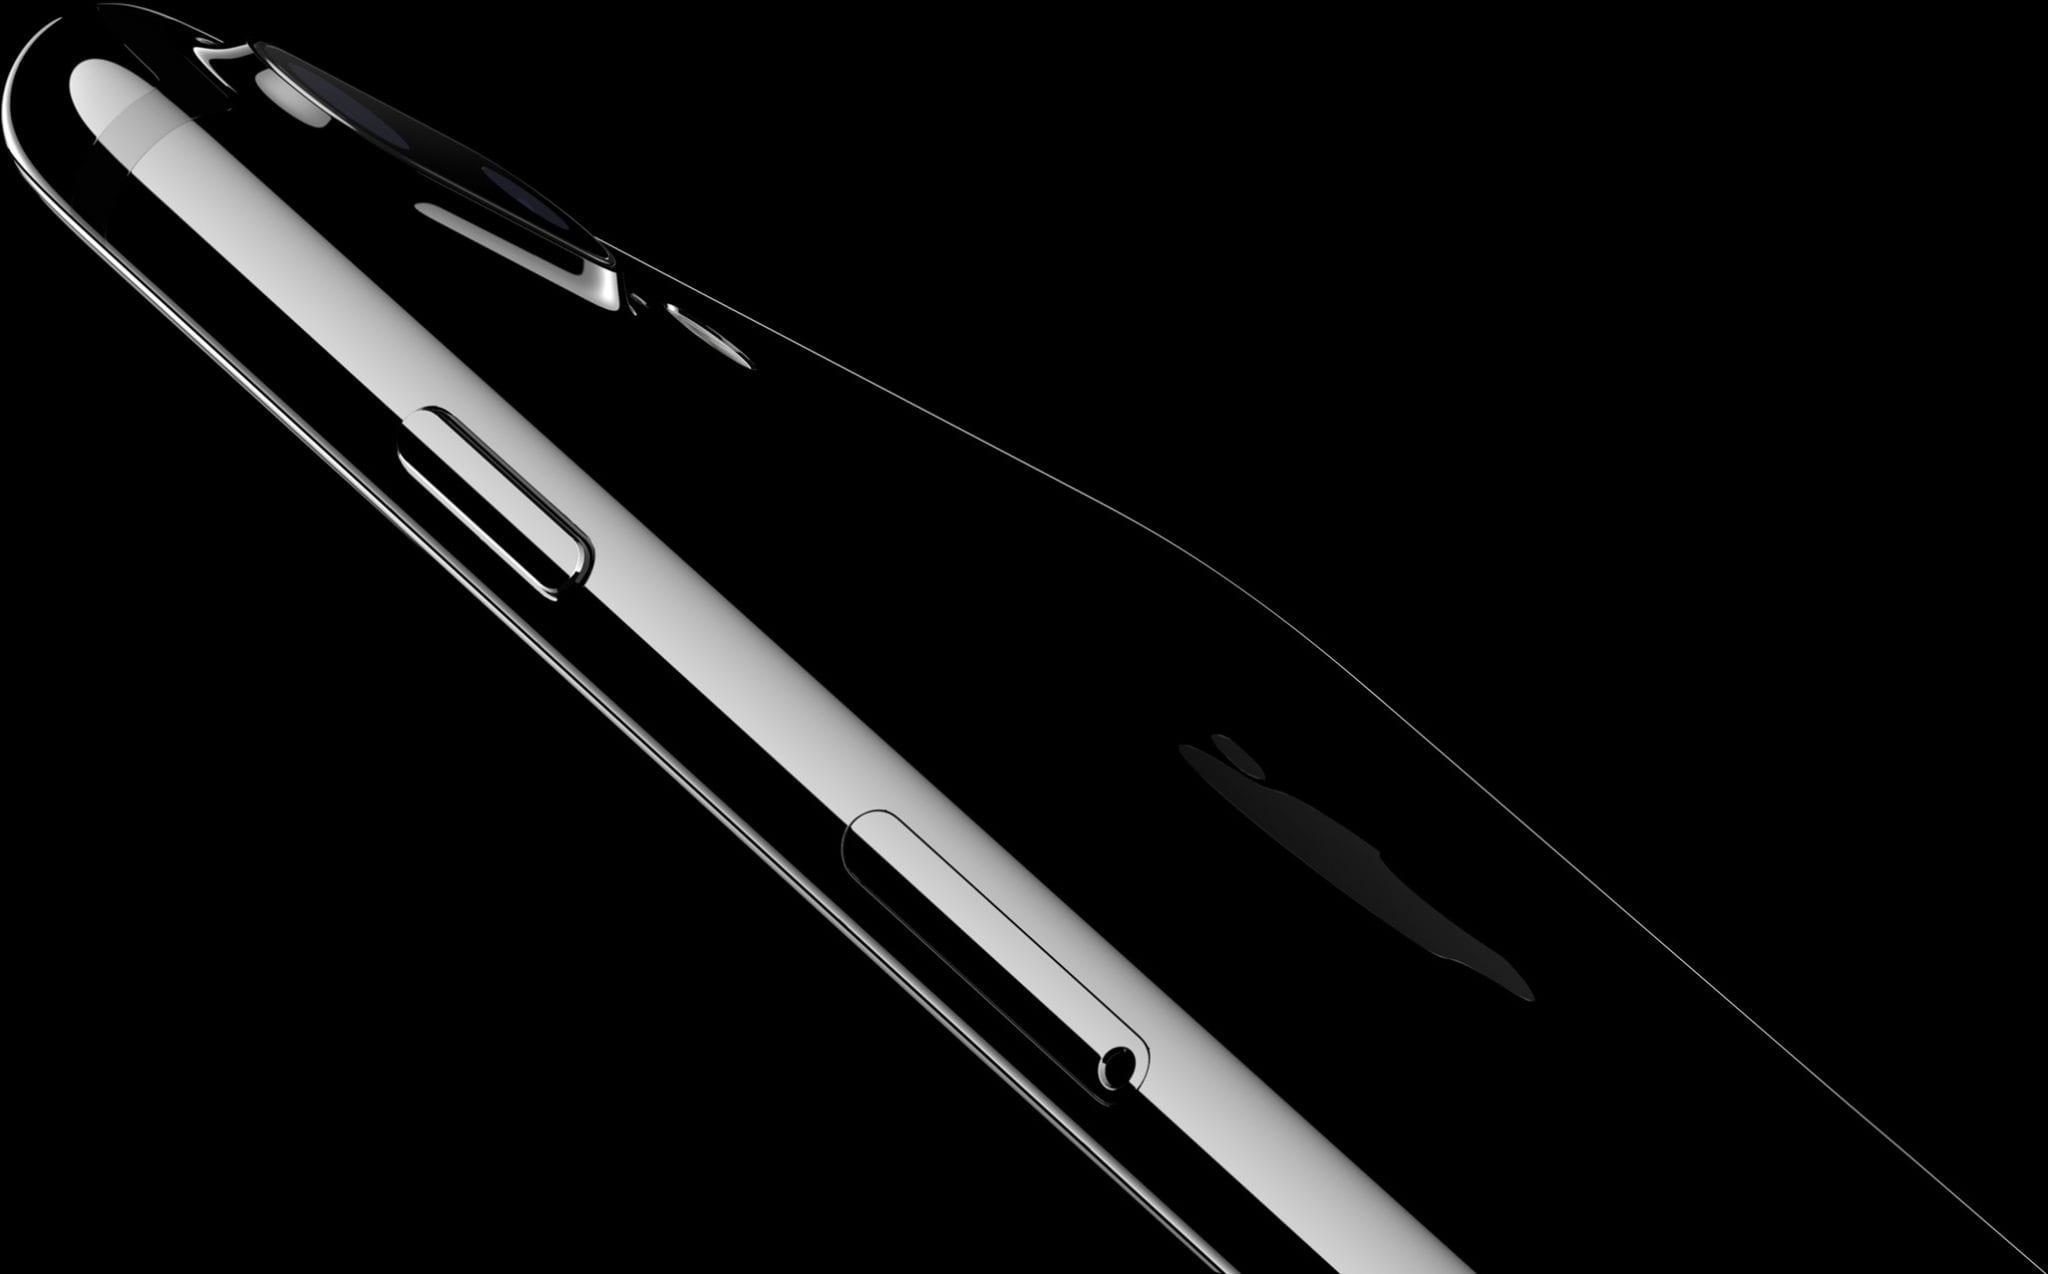 iphone 7 plus design jet black - iPhone 7 ani iPhone 8 si už v Nemecku nekúpite. Apple ho stiahol z obehu